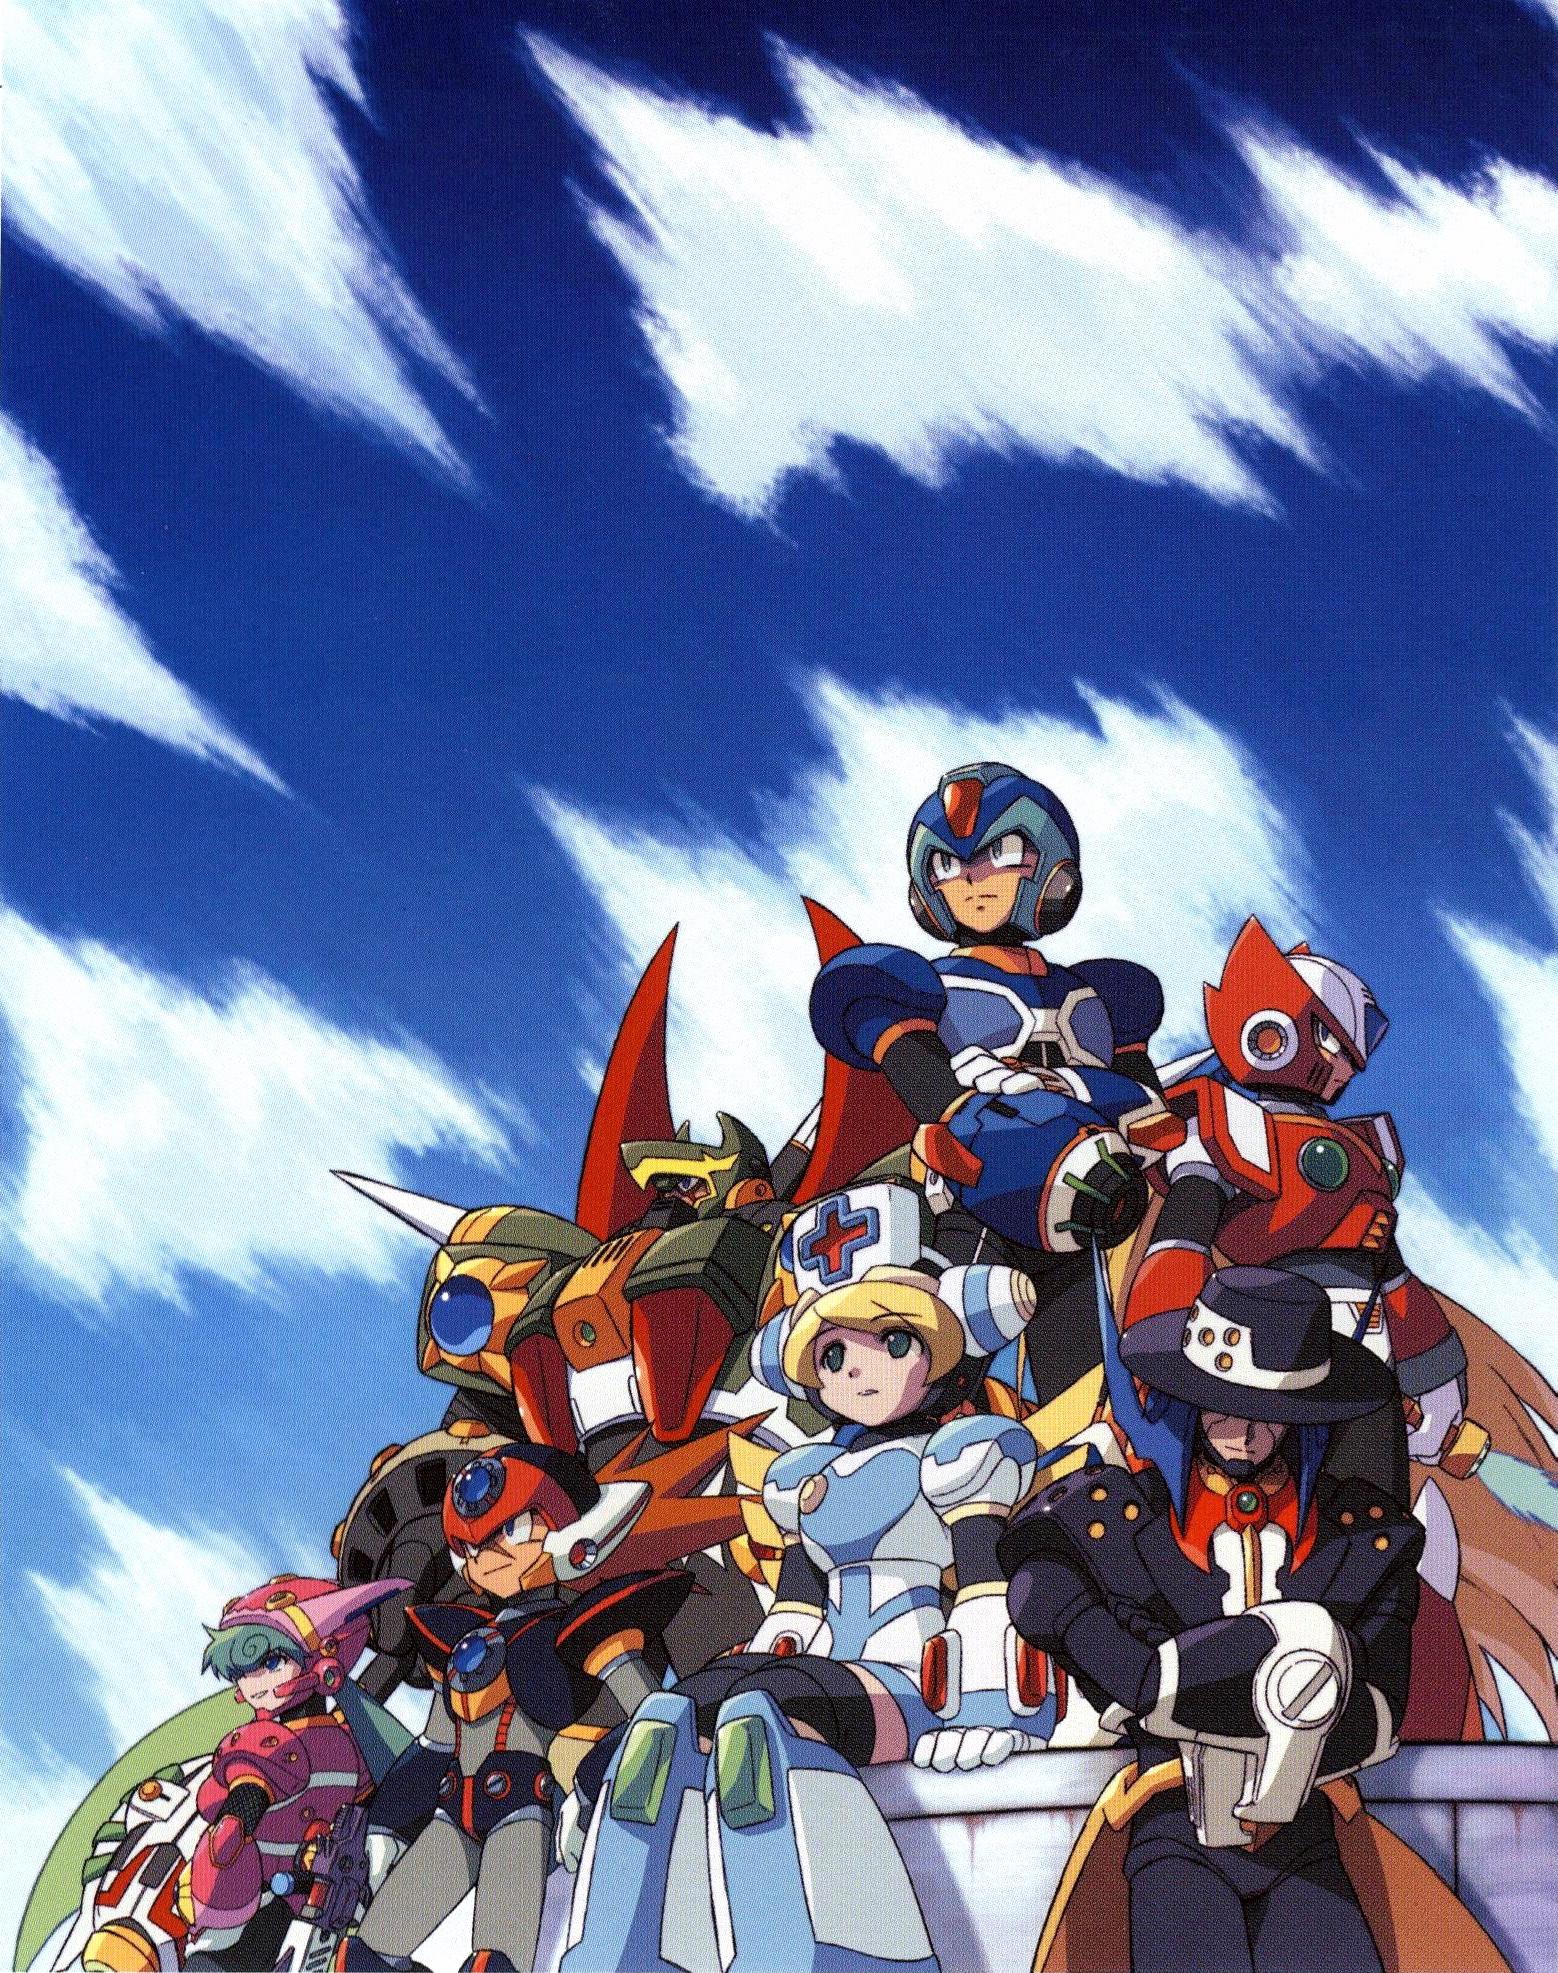 Mega Man X: Command Mission | MMKB | FANDOM powered by Wikia